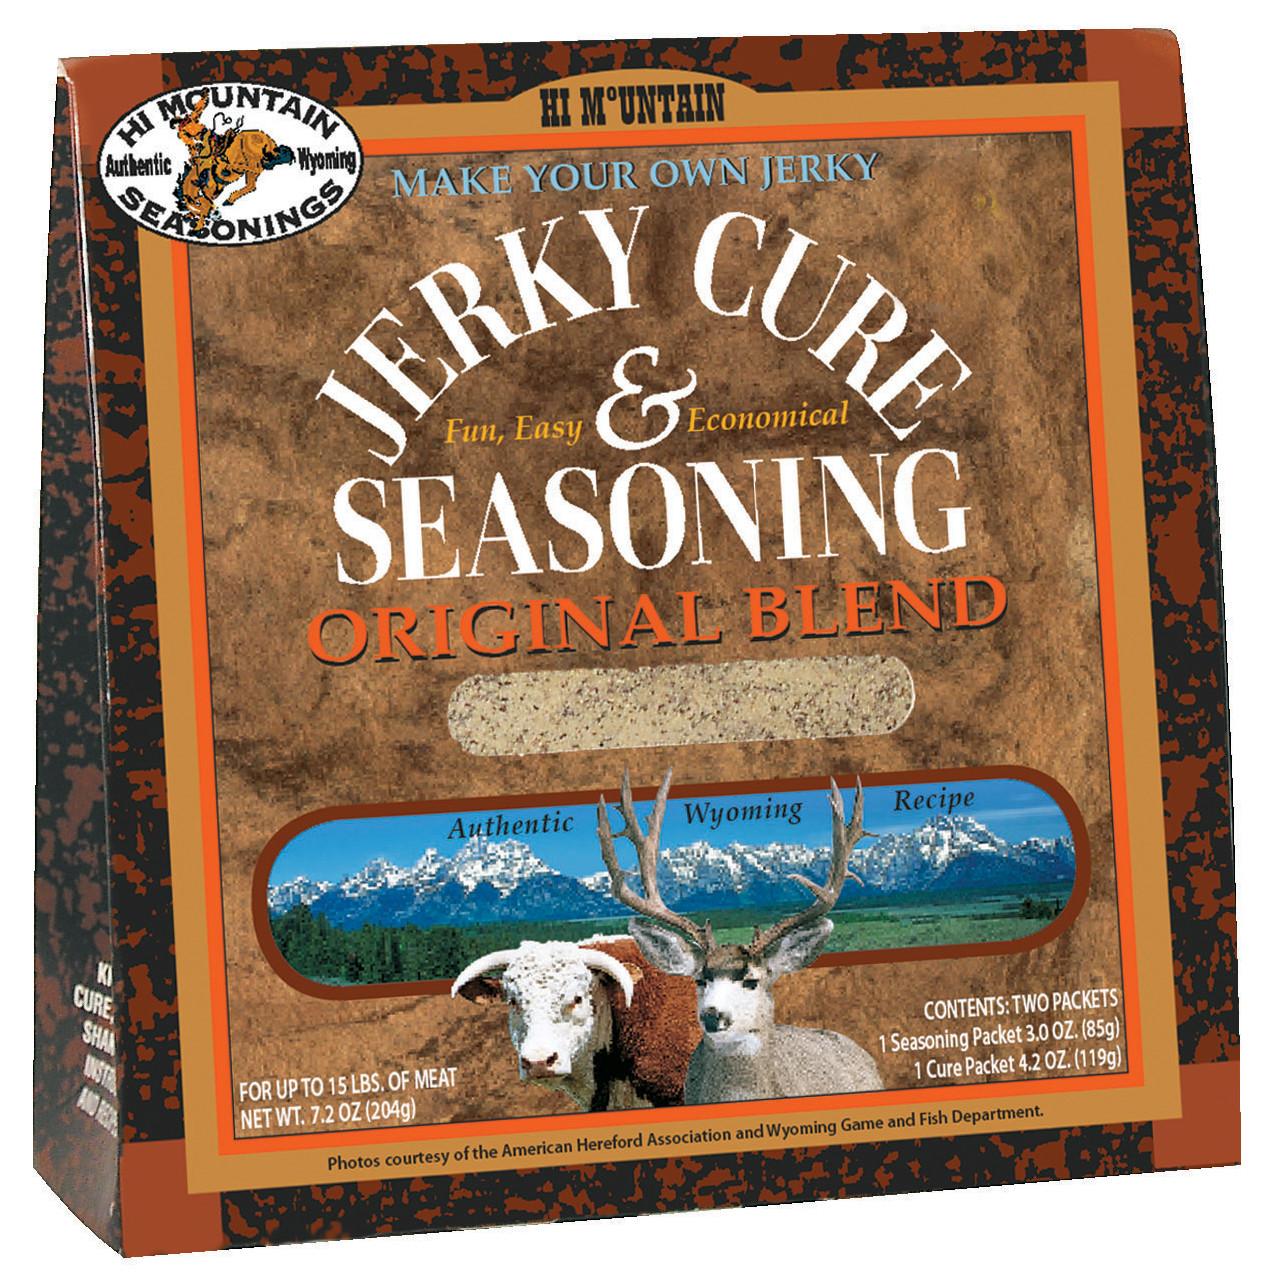 Original Blend Jerky Kit